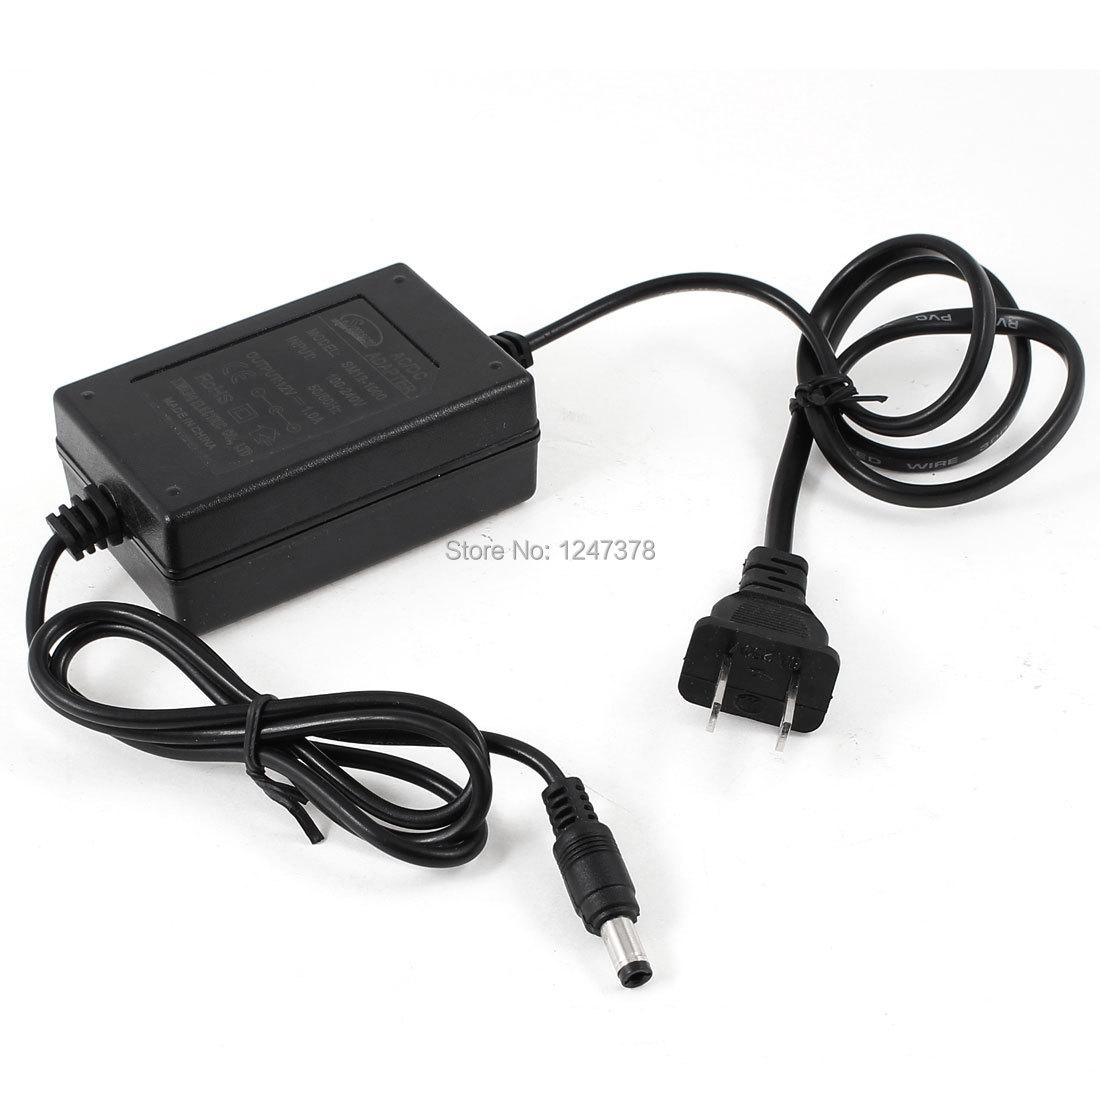 12V 1A US Plug Security Camera Power Supply AC/DC Adapter Output Plastic Houseing(China (Mainland))